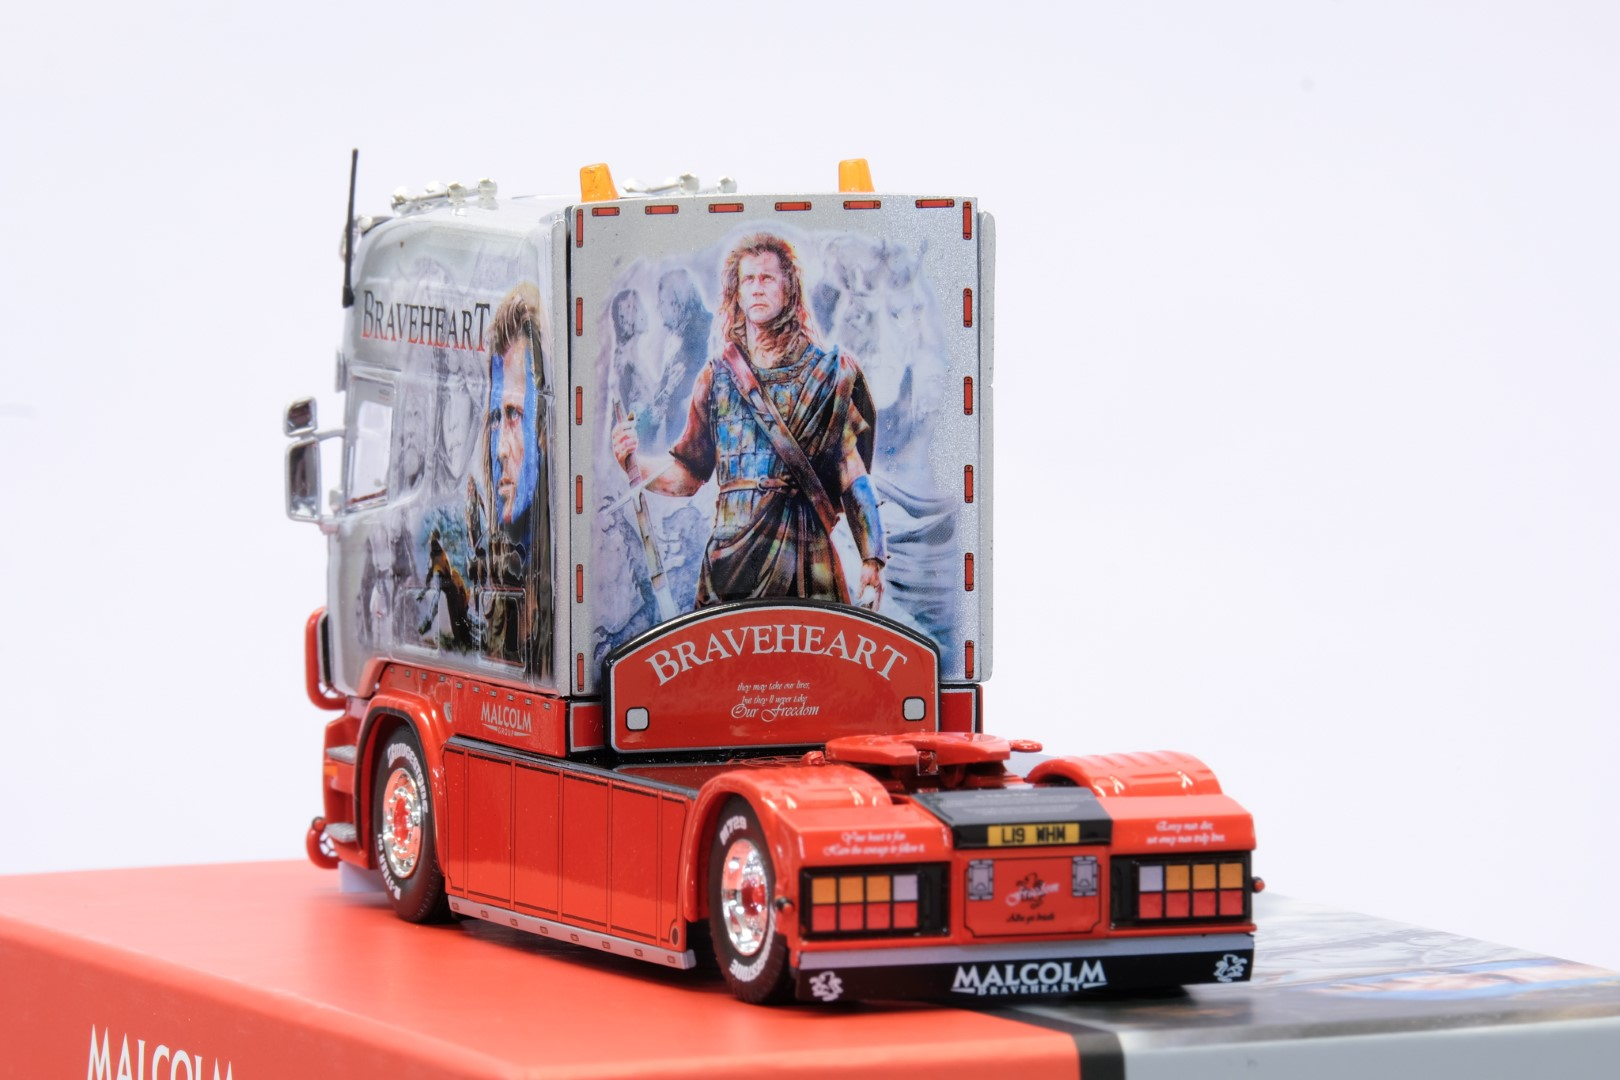 Tekno Scania R-series Longline - W.H. Malcolm Braveheart - Image 3 of 6